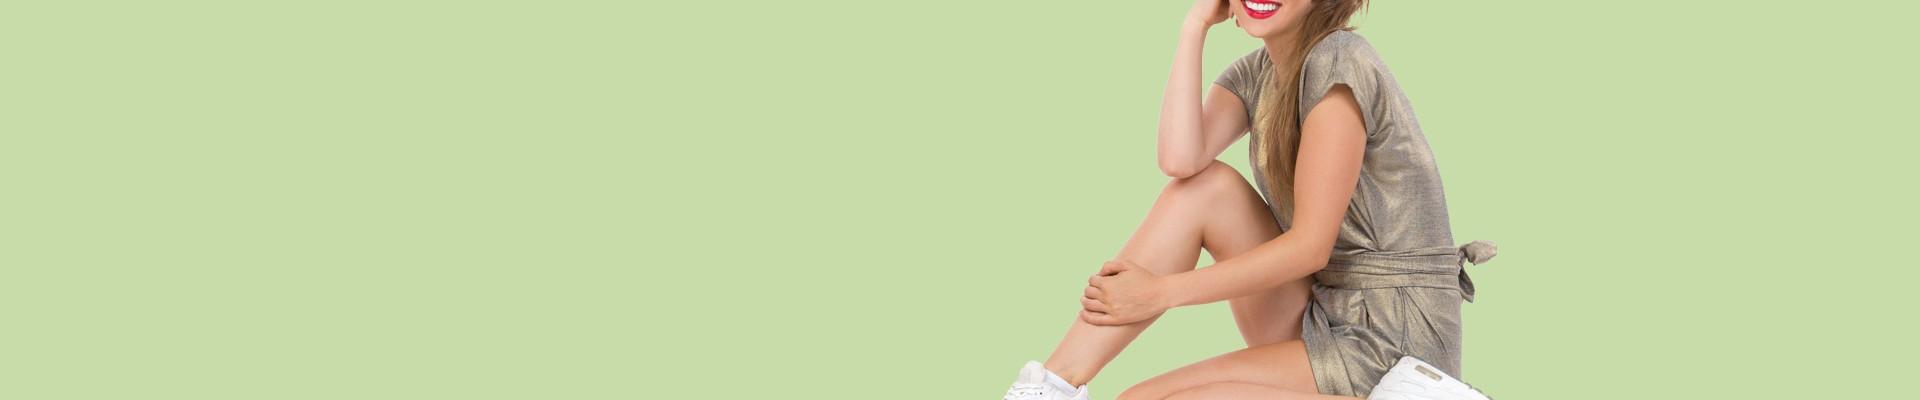 Jual Mini Dress Cantik Wanita Terlengkap Online